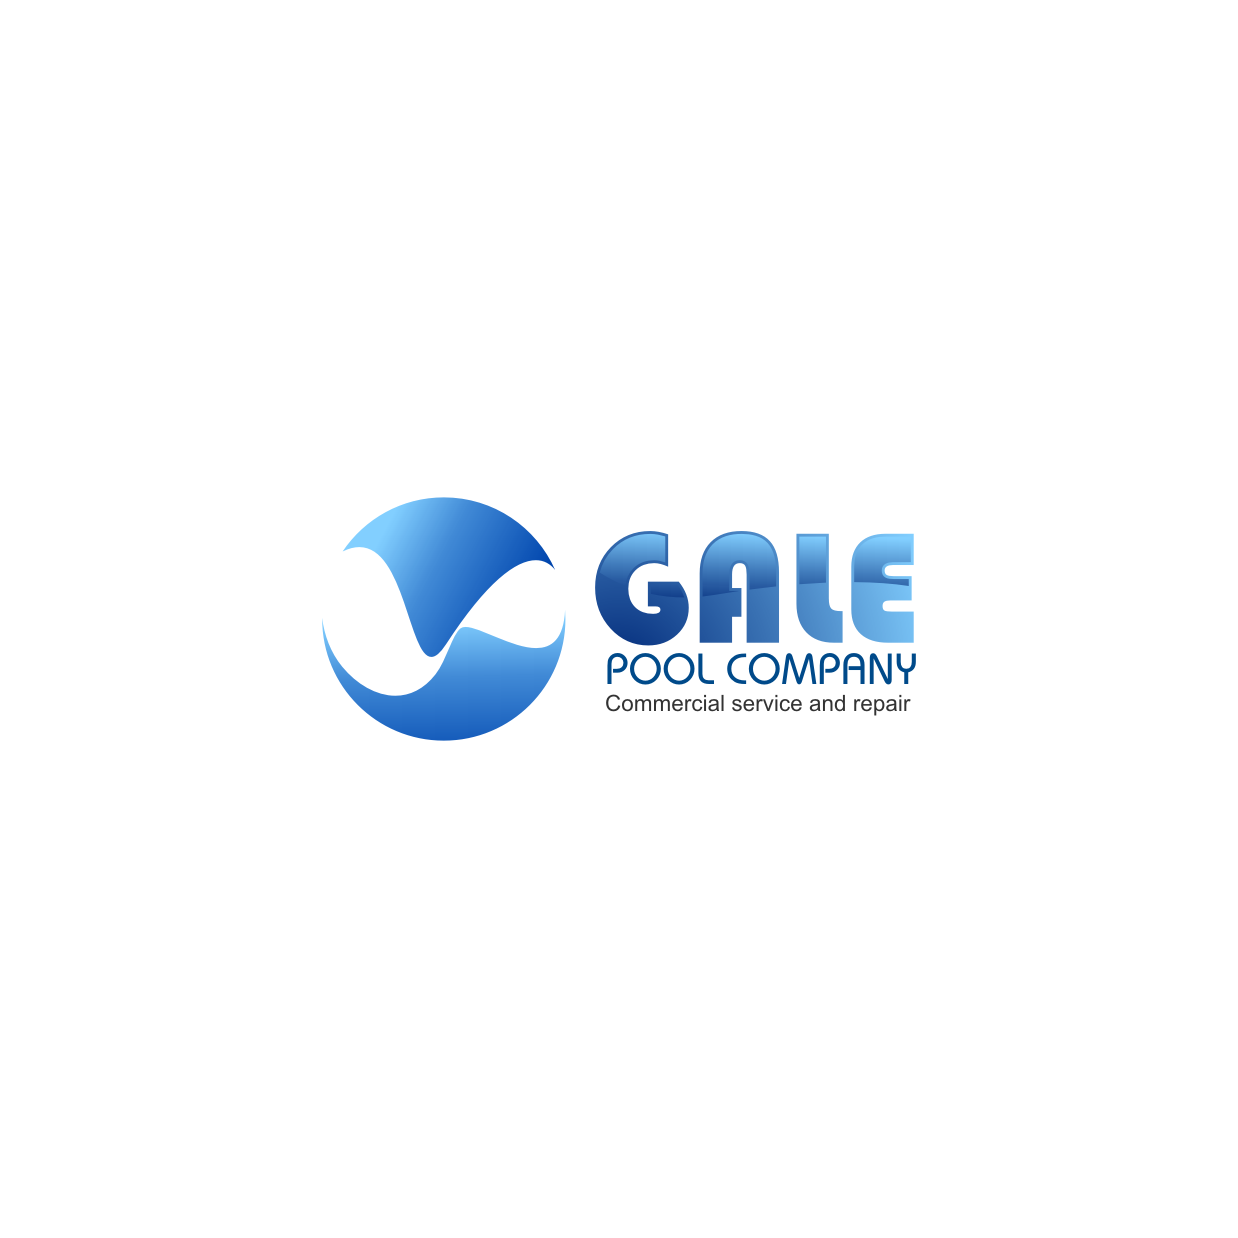 Logo Design by rifatz - Entry No. 103 in the Logo Design Contest Imaginative Logo Design for Gale Pool Company.